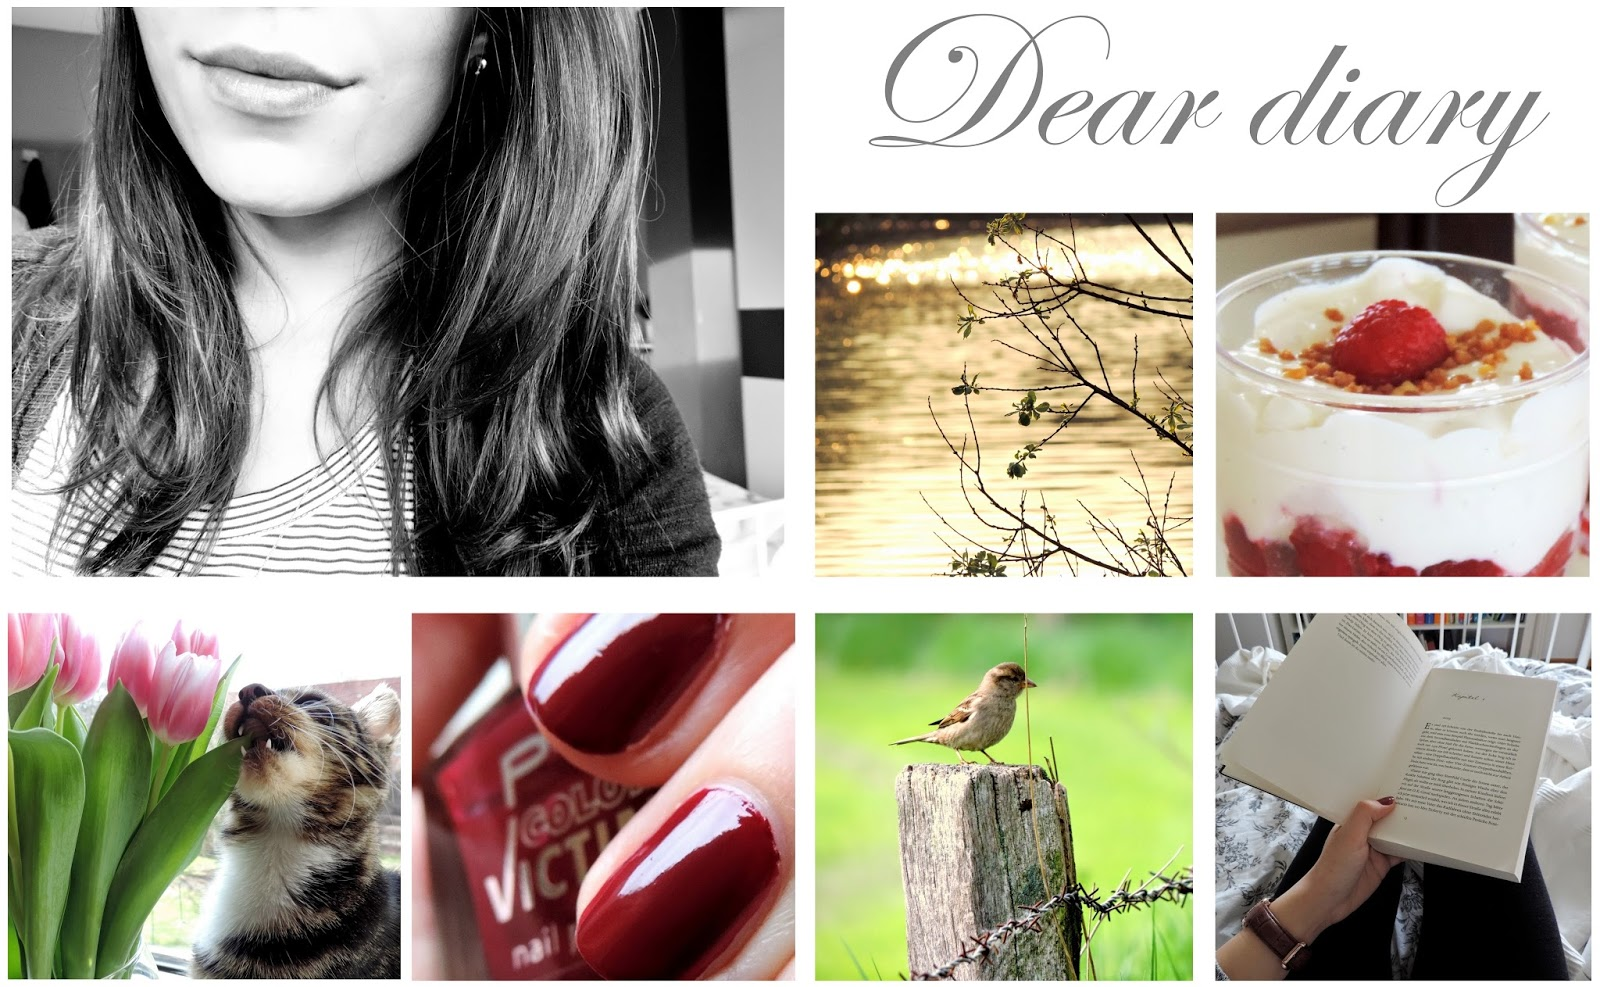 http://deardiarybrn.blogspot.de/